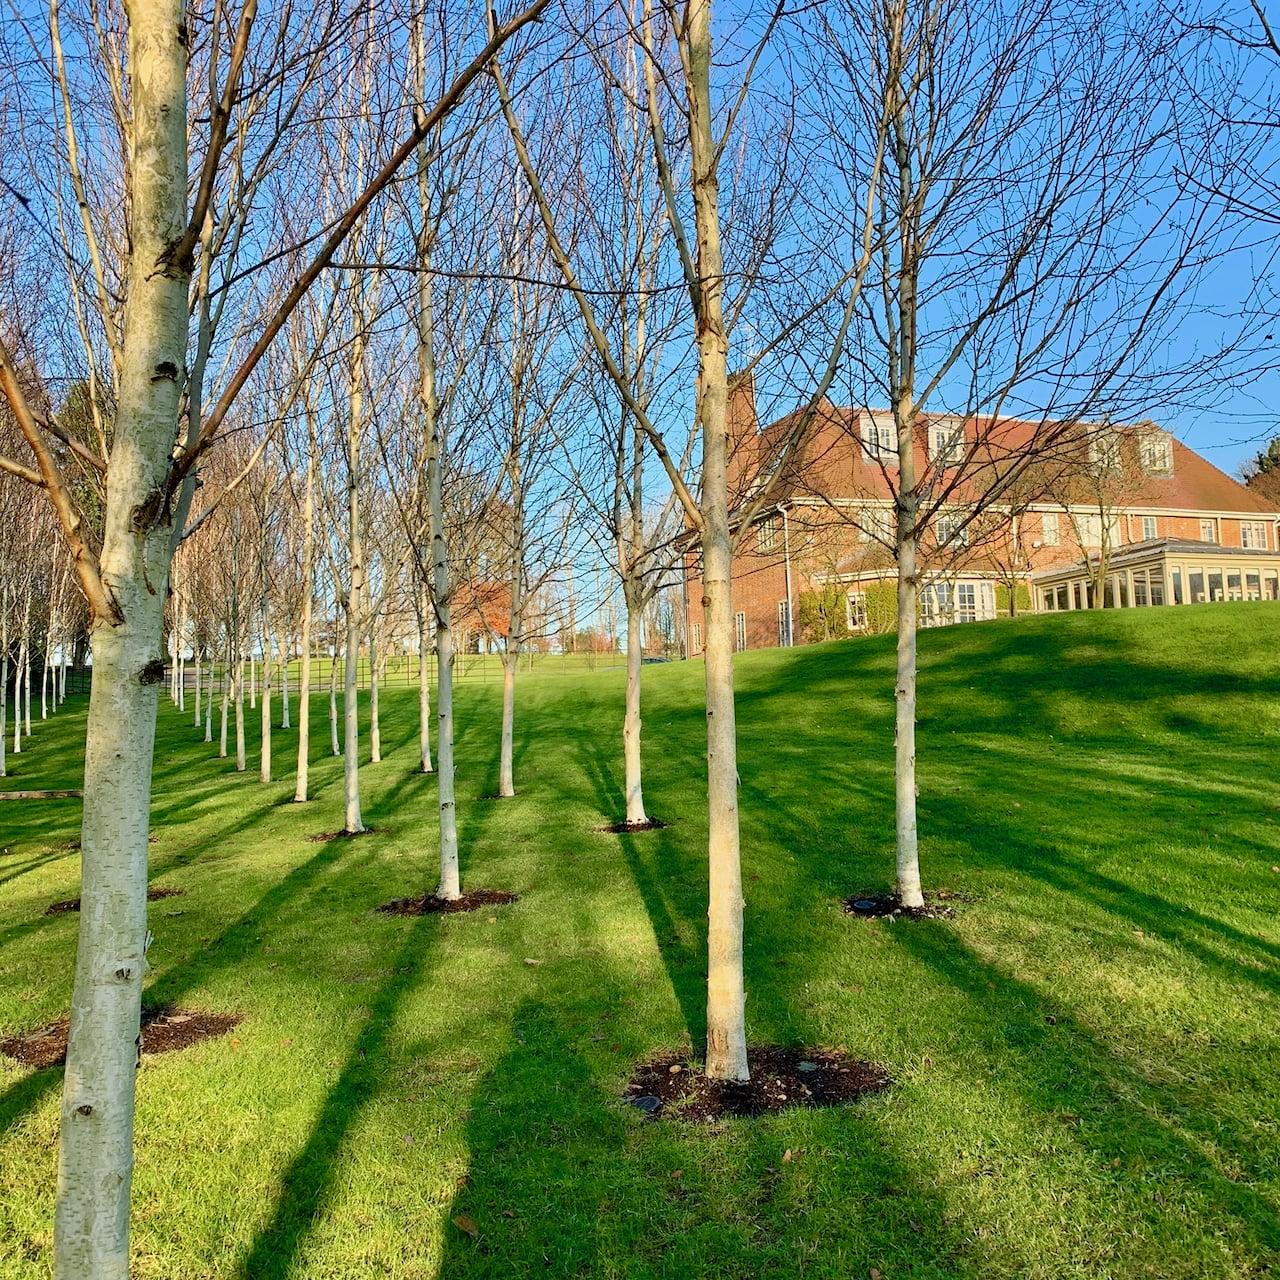 Silver birch trees mass planted in this Buckinghamshire garden by Jo Alderson Phillips